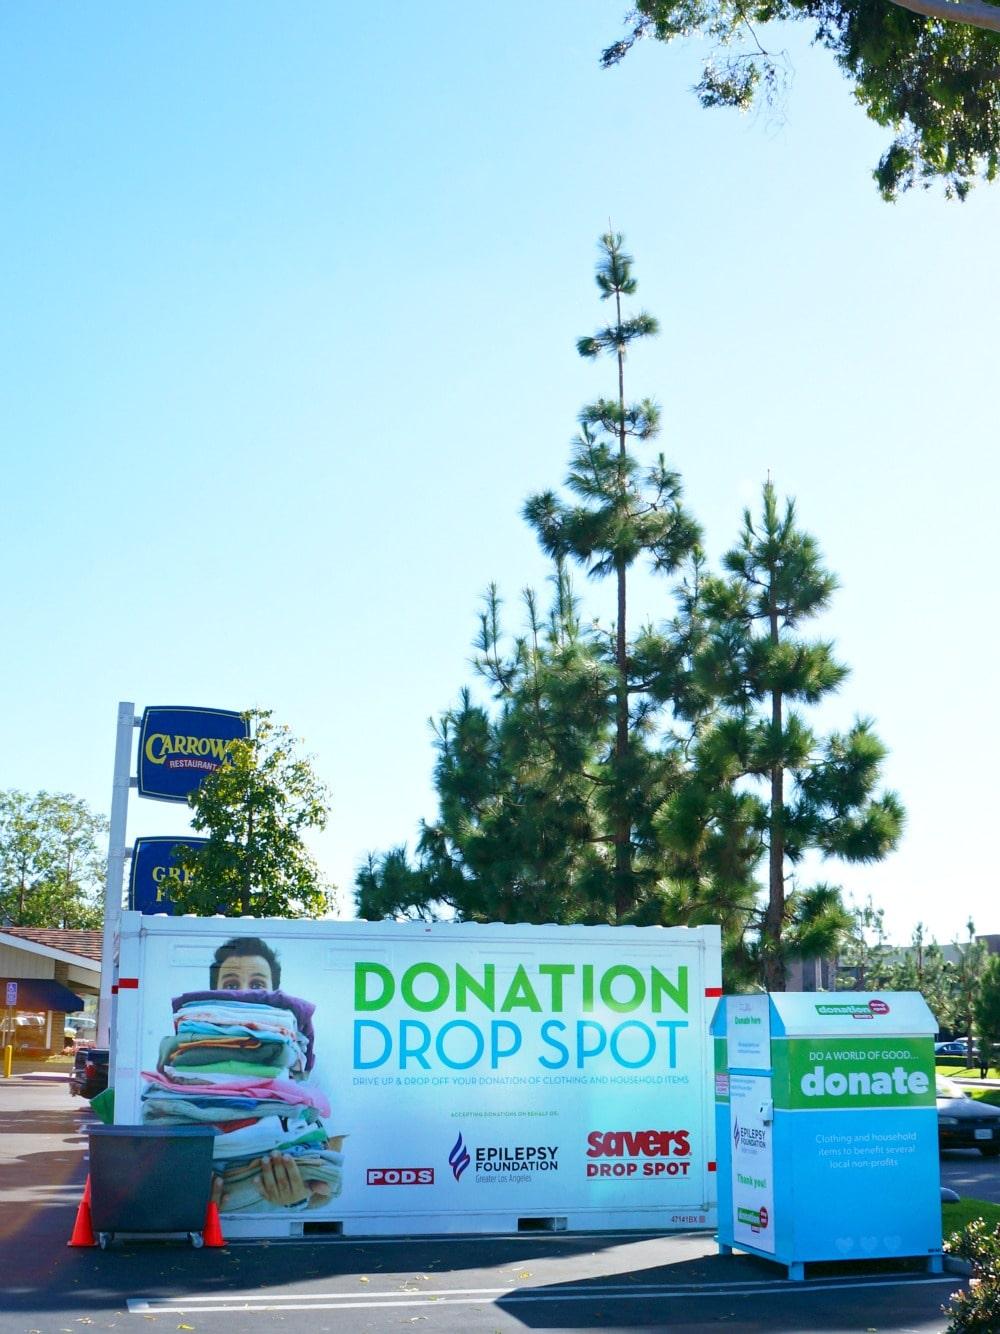 Savers Donation Drop Spots in Orange County